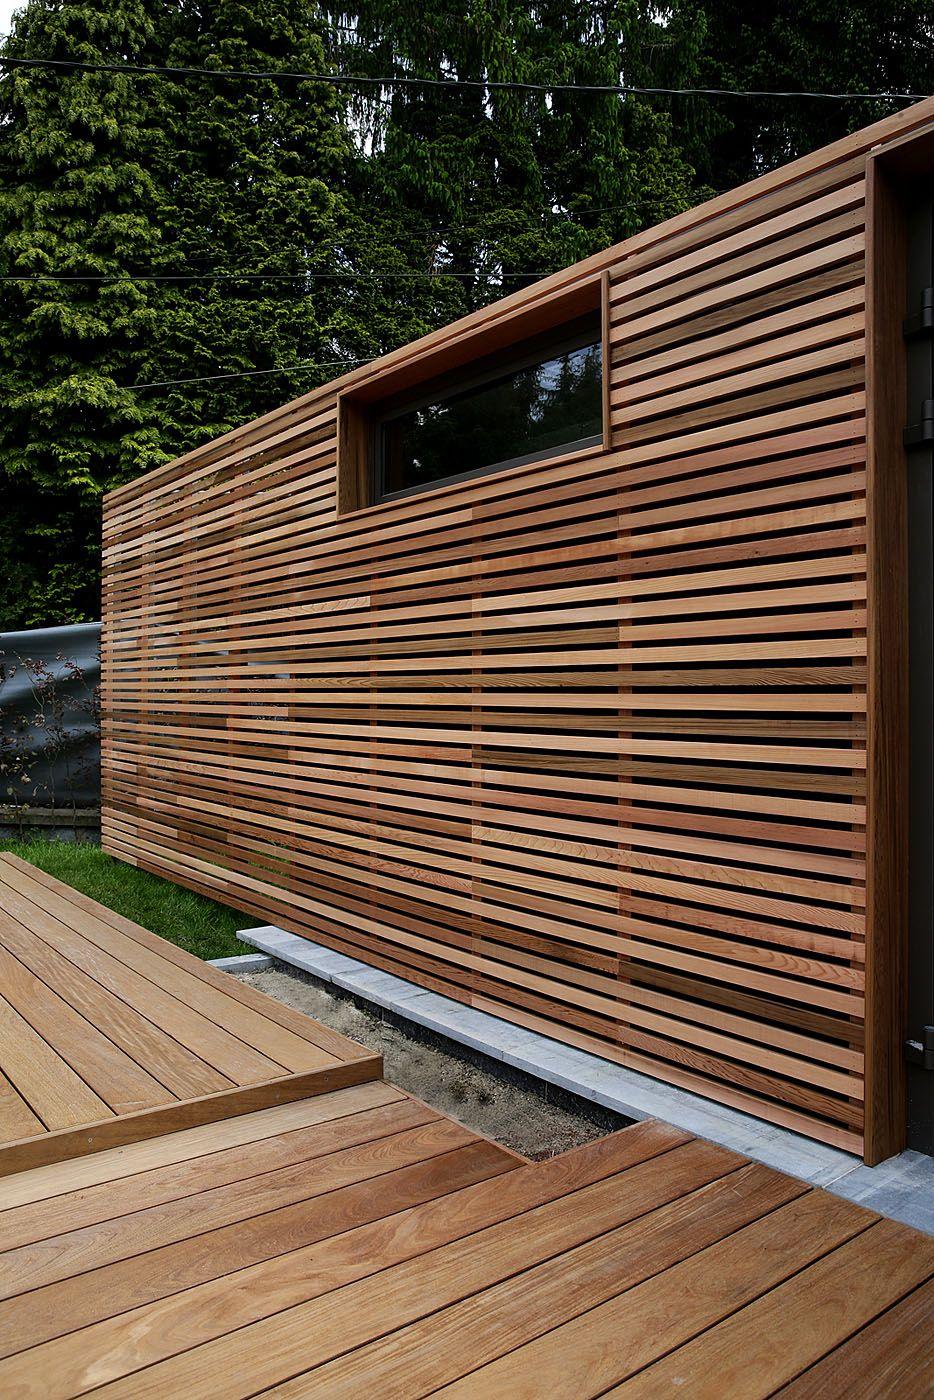 Yves deneyer menuiserie bois portugal en 2019 pinterest haus mit garage scheune et garage - Baraque de jardin ...